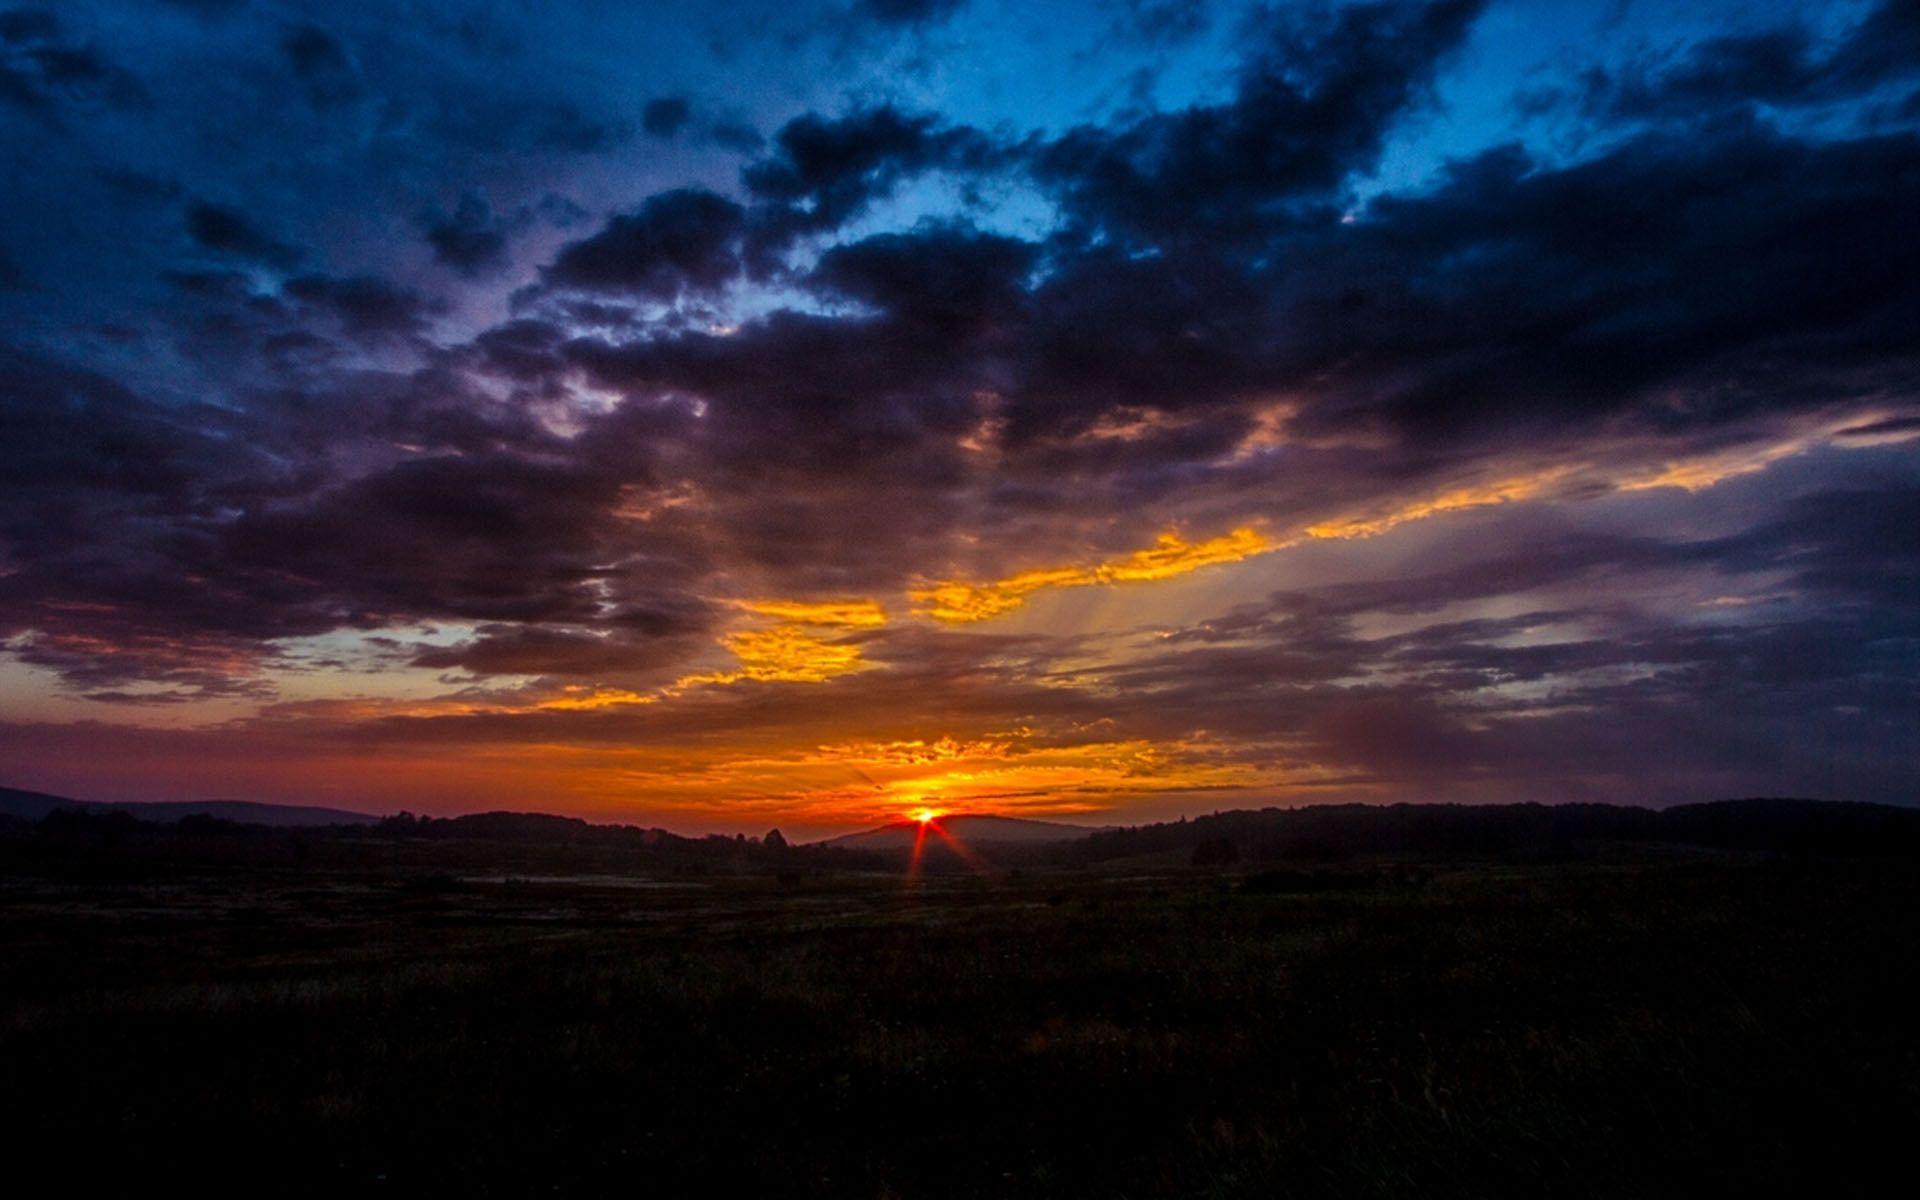 Sunrise dawn HD wallpaper | Hd wallpaper, Wallpaper, Sunrise